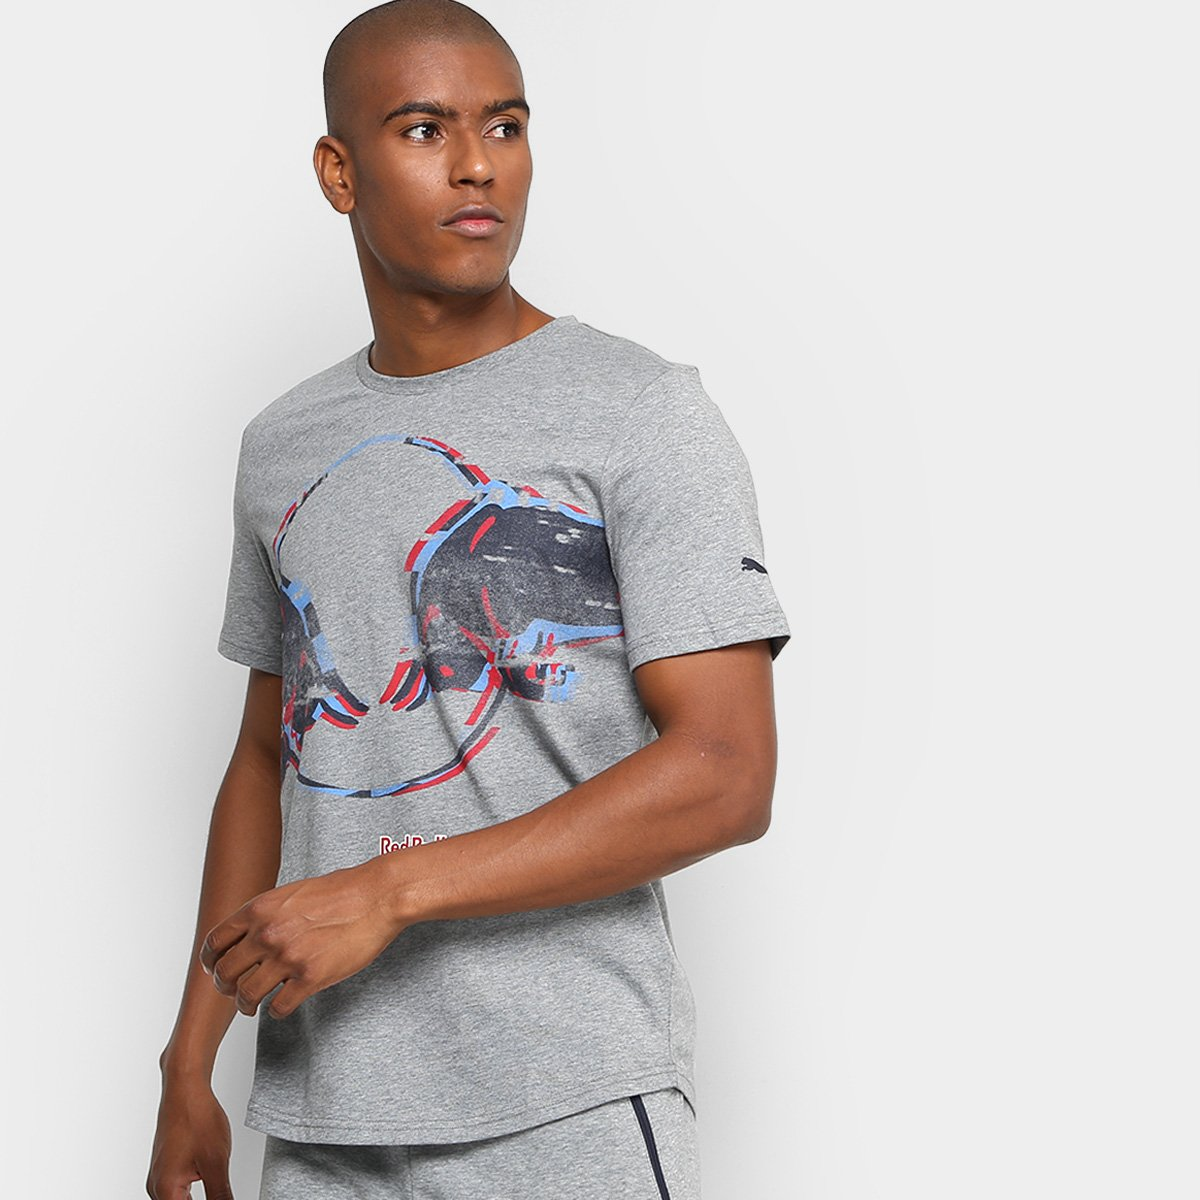 Camiseta Puma Red Bull Racing Double Bull Masculina - Compre Agora ... 982d9458fd3